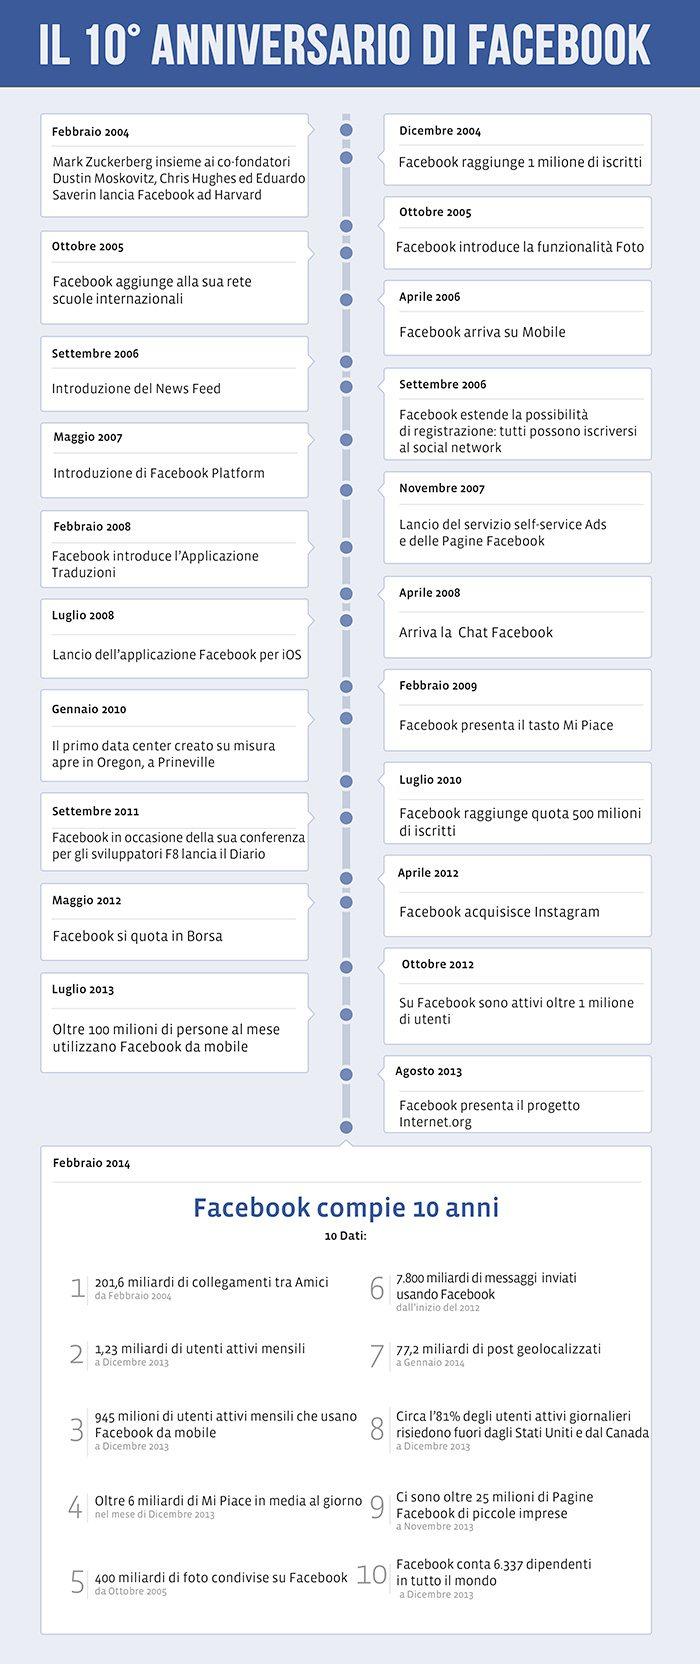 Infografica Facebook 10 anni